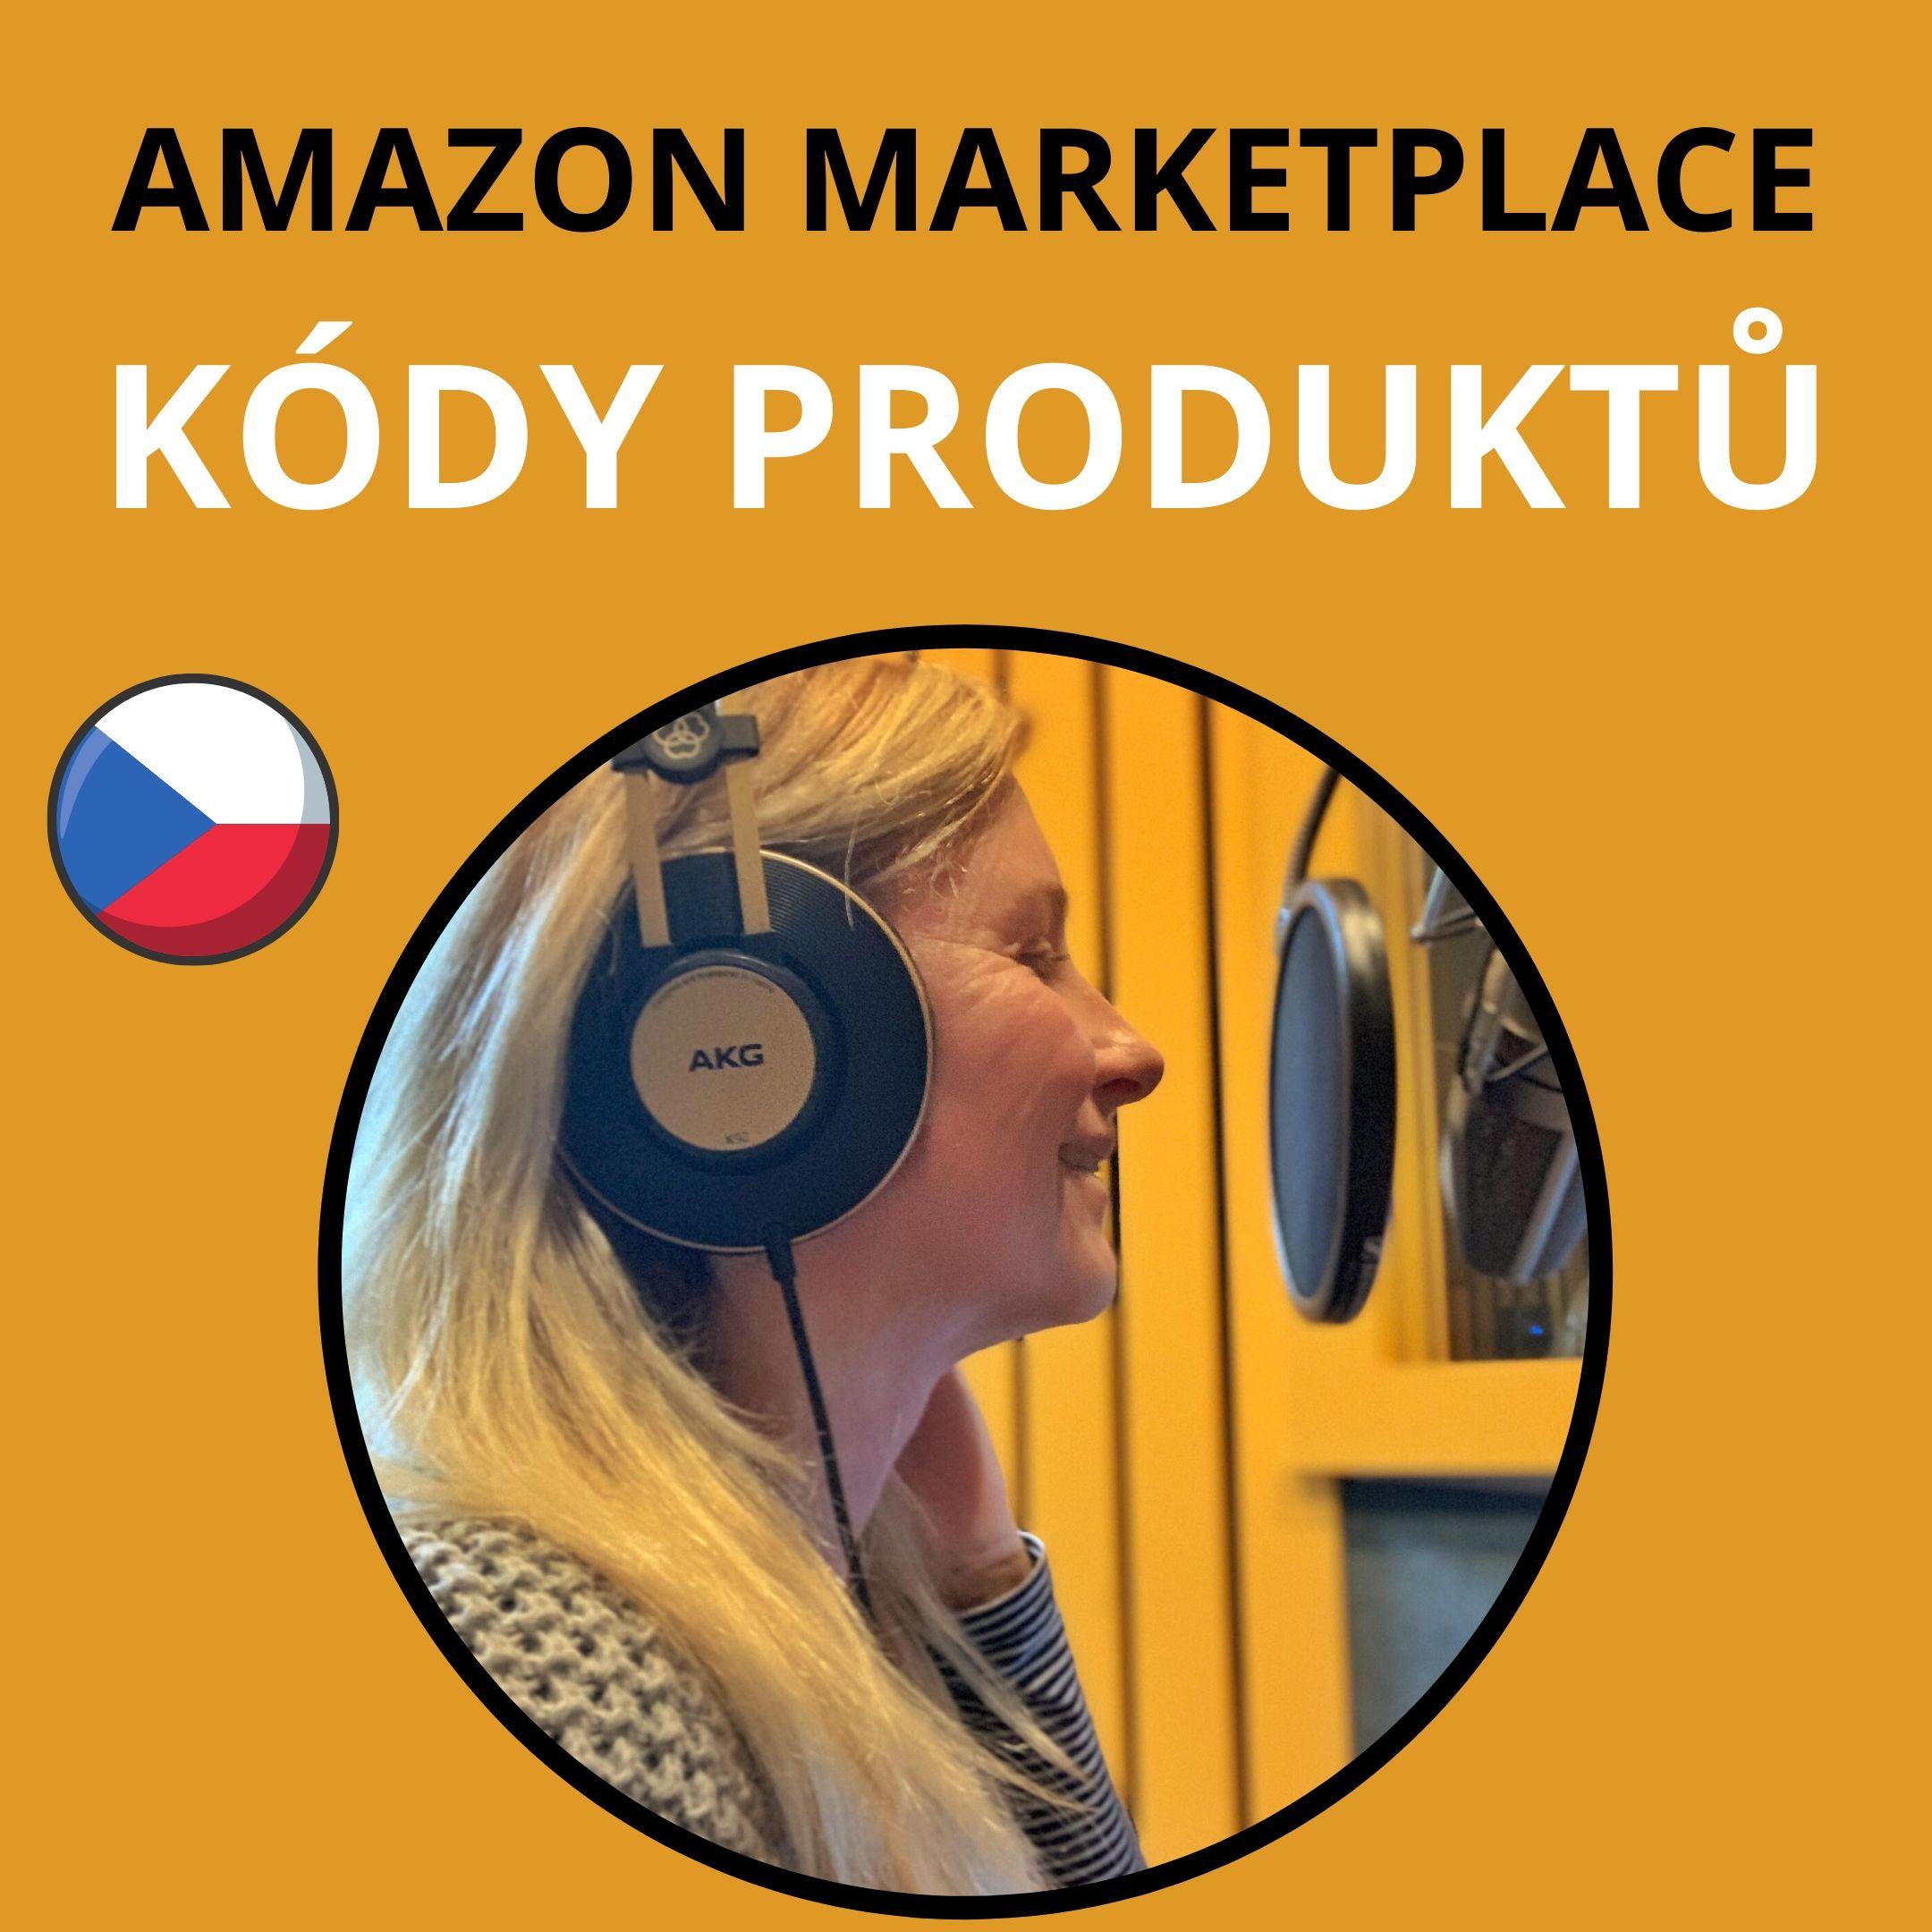 004 | Kódy produktů na Amazonu